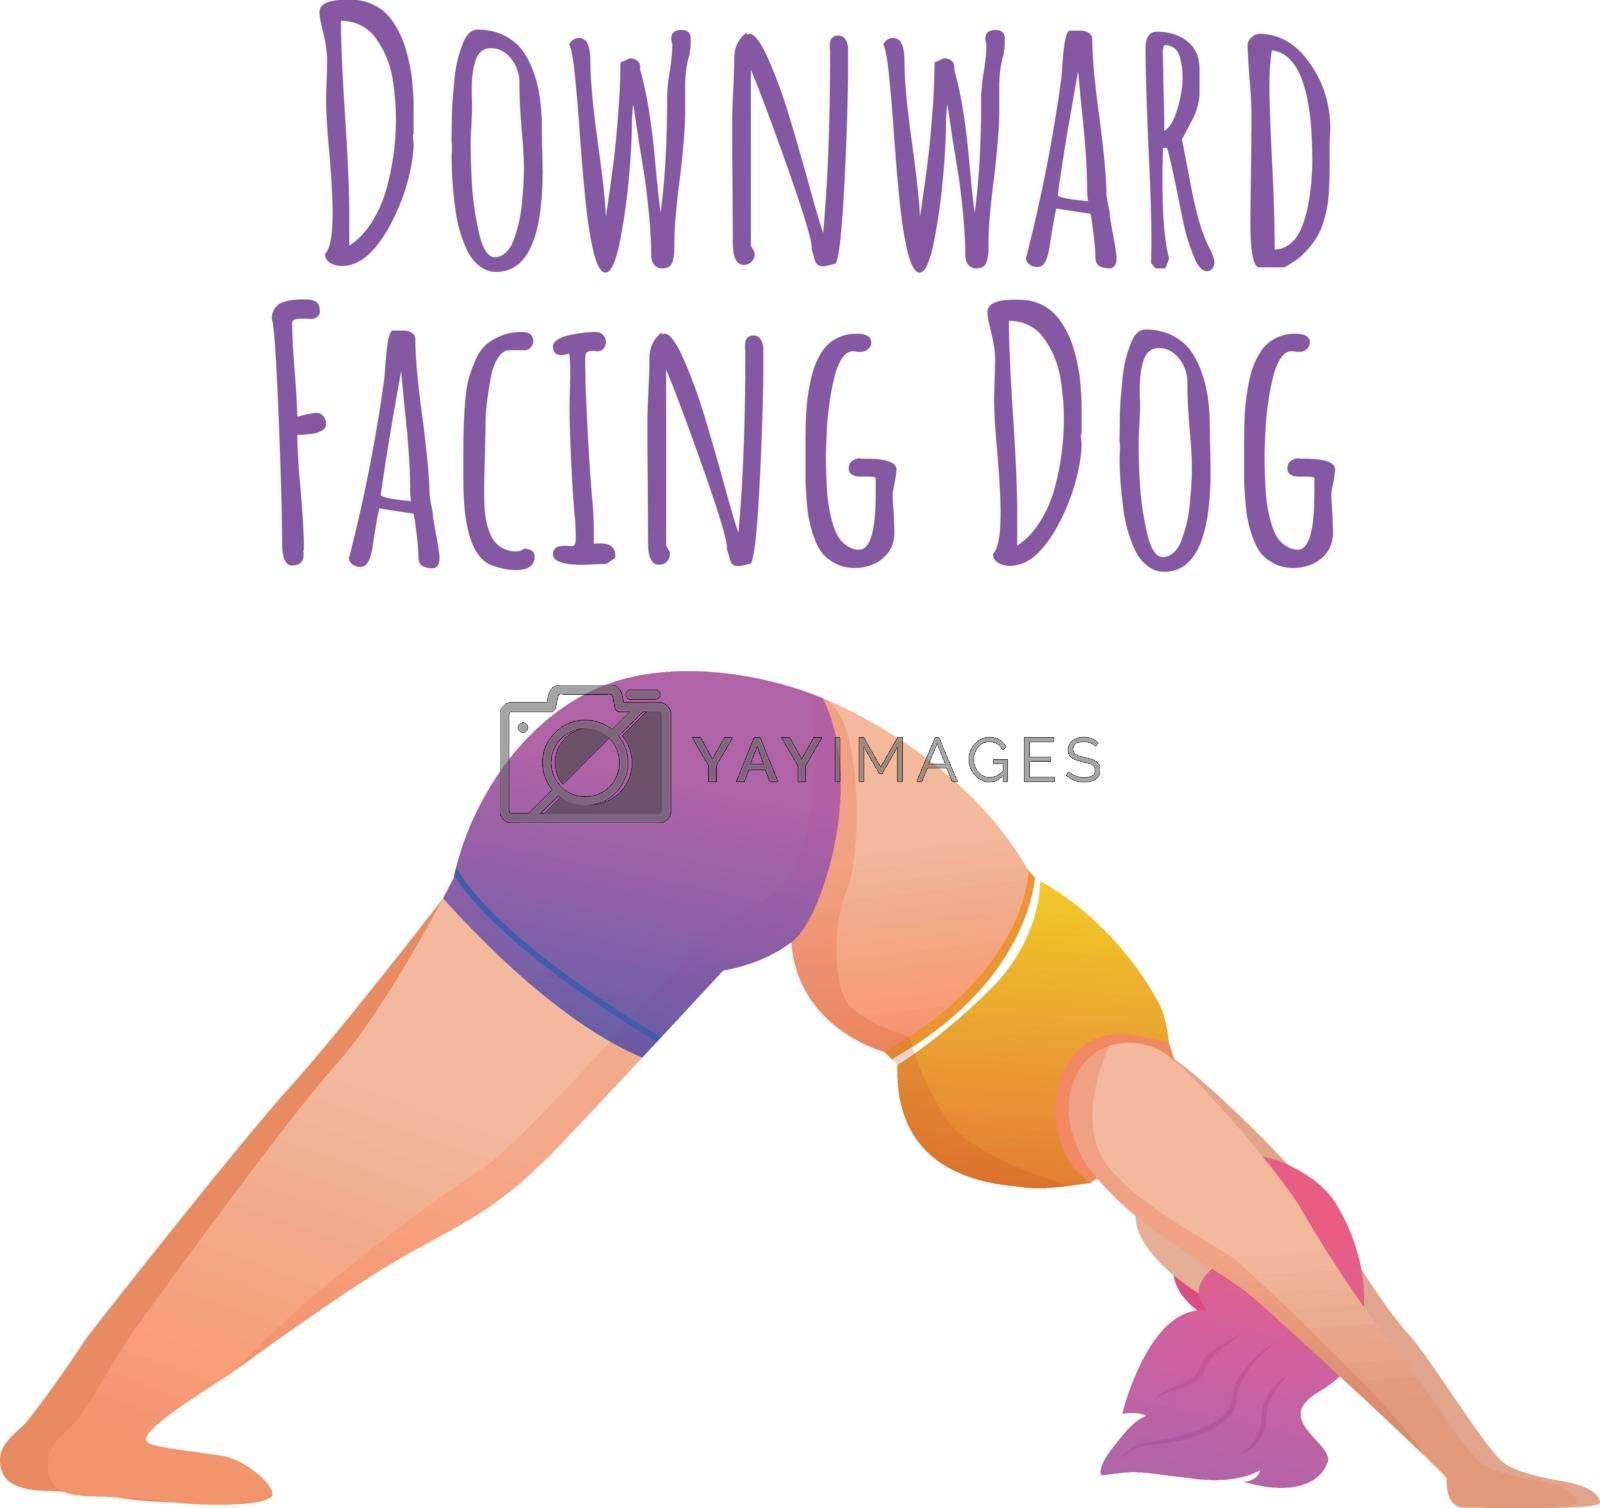 Downward facing dog pose social media post mockup. Adho Mukha Shvanasana. Yoga. Web banner design template. Social media booster, content layout. Poster, printable card with flat illustrations by ntl